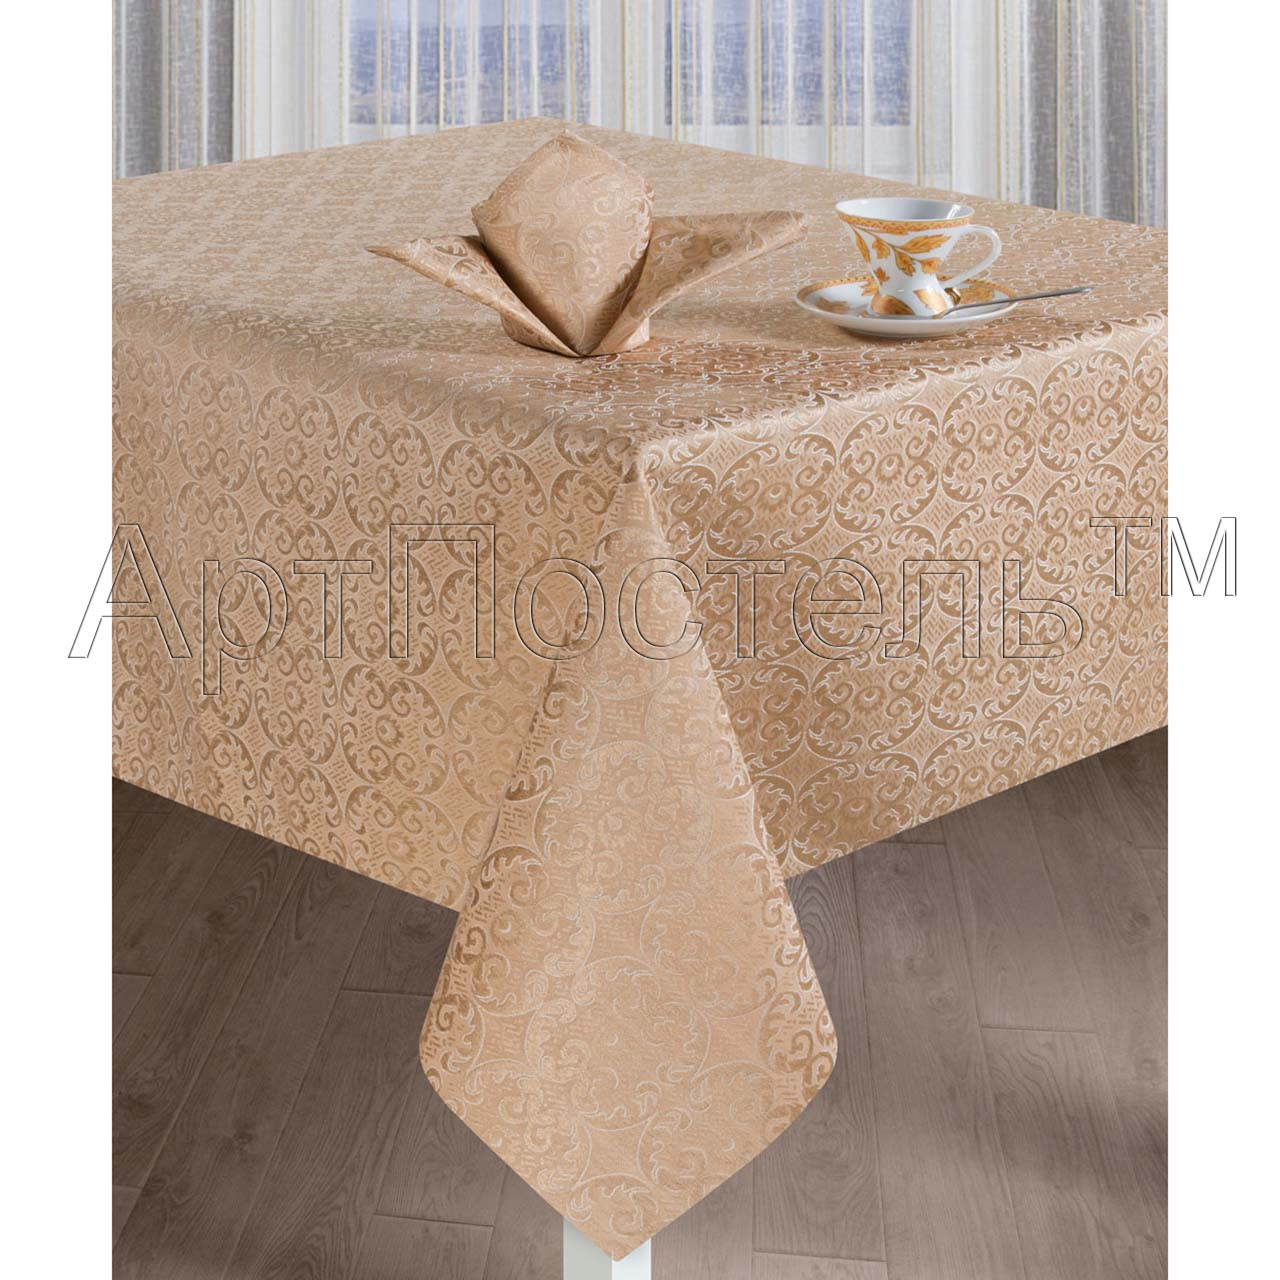 Кухонные принадлежности Марго Капучино р. 260х150Кухонные принадлежности<br>Скатерть:260х150 см - 1 шт.<br>Салфетка:40х40 см - 6 шт.<br><br>Тип: Кухонные принадлежности<br>Размер: 260х150<br>Материал: Жаккард